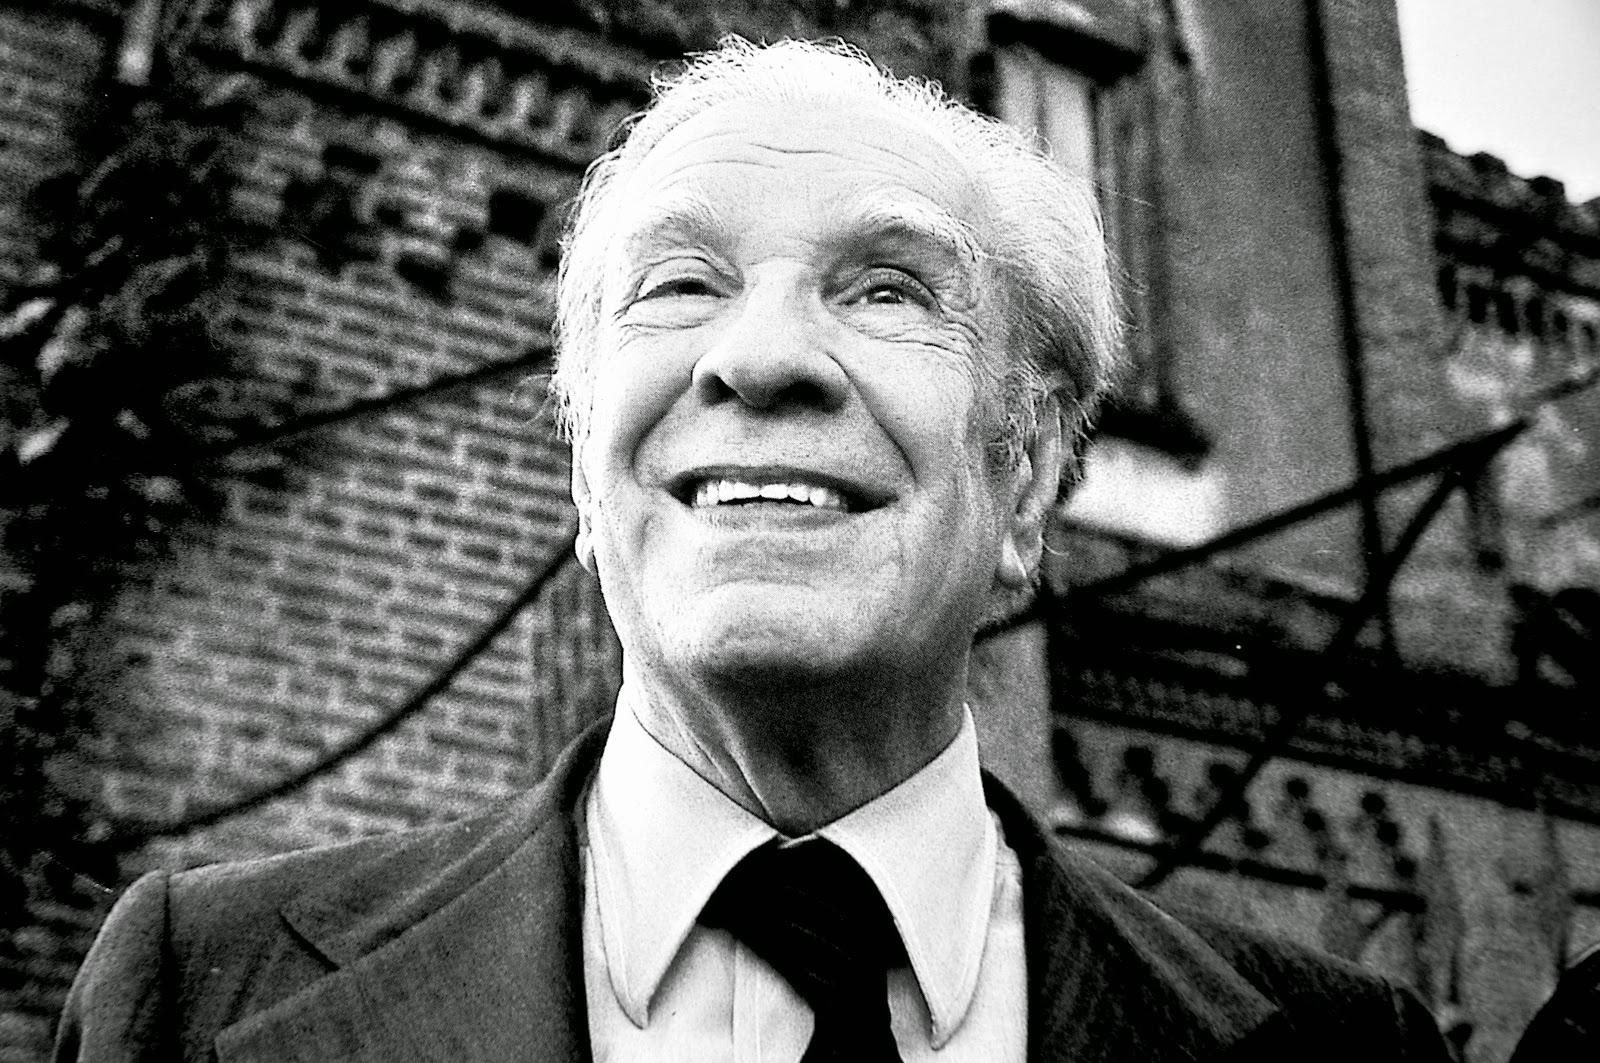 Poetas latinoamericanos: Arte poética Jorge Luis Borges